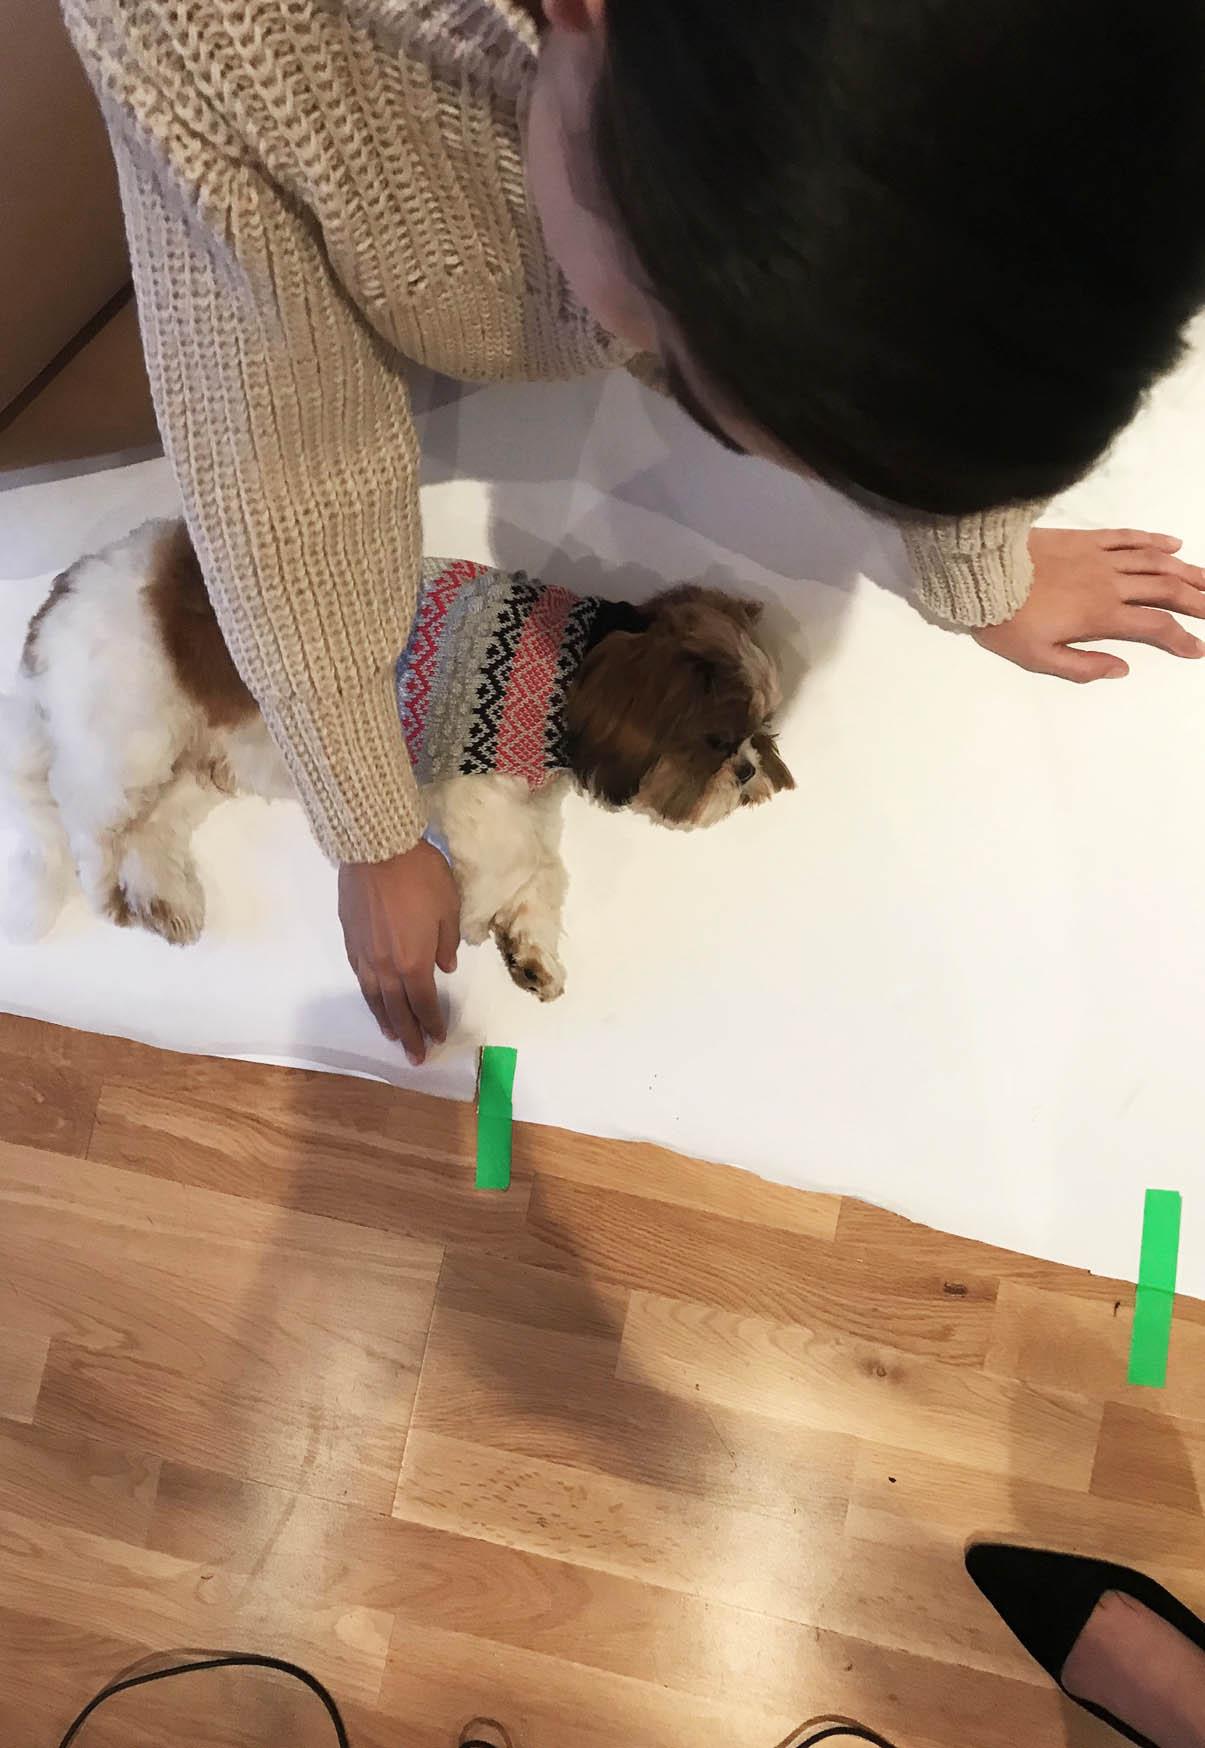 DOG JUMPER KNITWEAR MADE IN UK